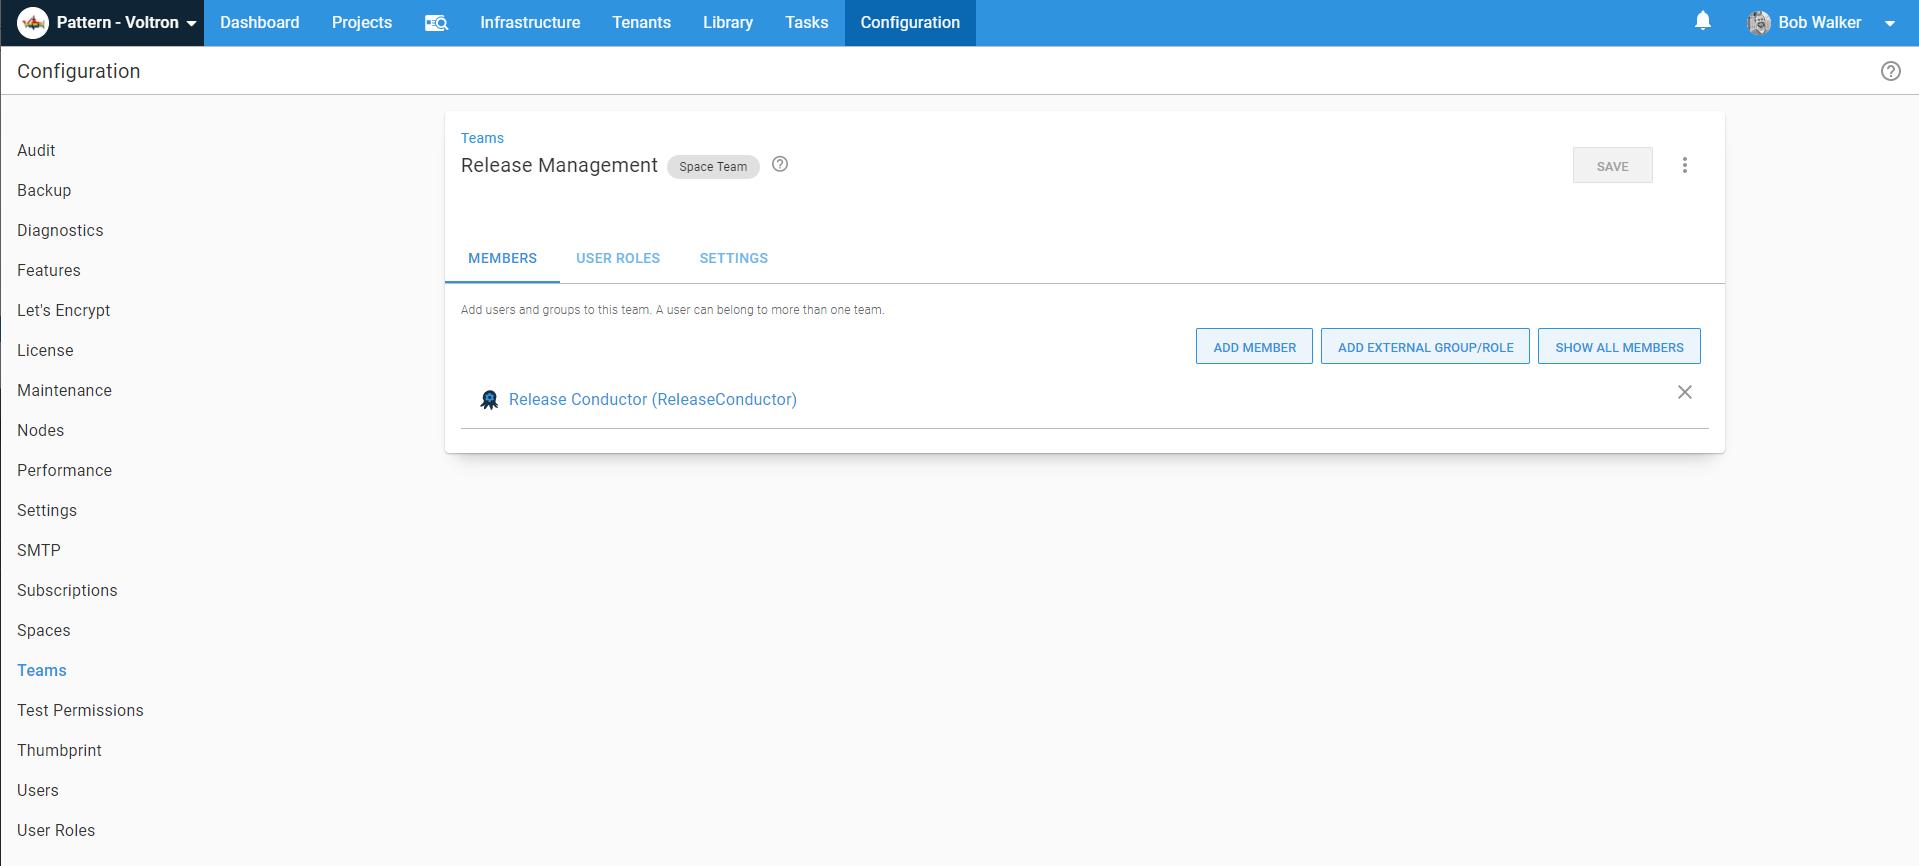 release management team